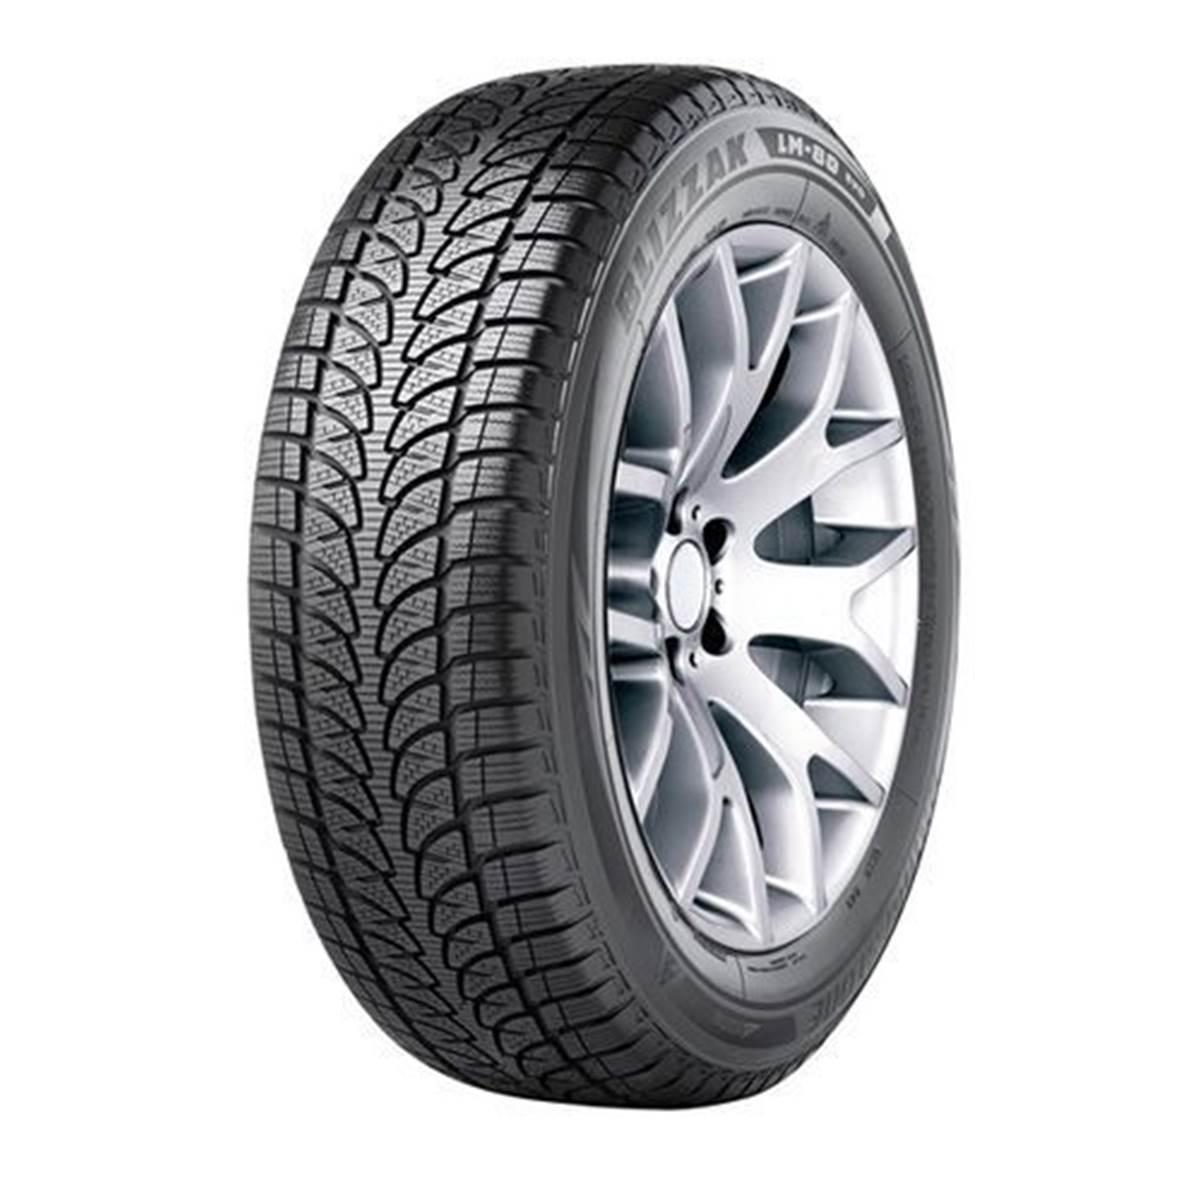 Pneu 4X4 Hiver Bridgestone 245/65R17 111H Blizzak Lm80 XL